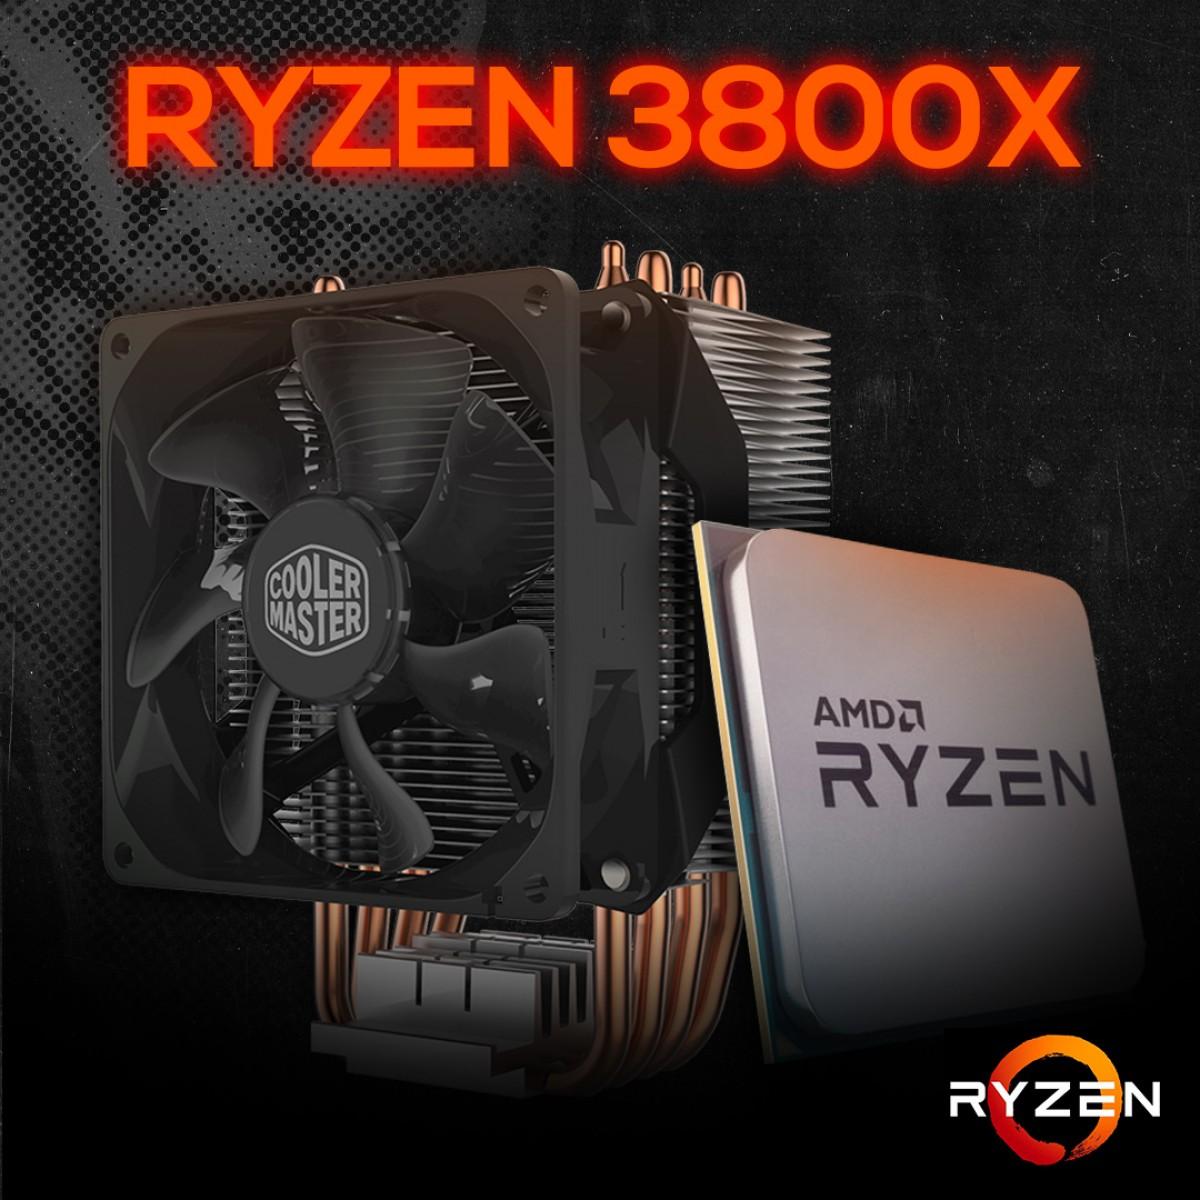 Kit Processador AMD Ryzen 7 3800x 3.9ghz (4.5ghz Turbo), 8-cores 16-threads, +  Cooler Master Hyper H412R 92mm